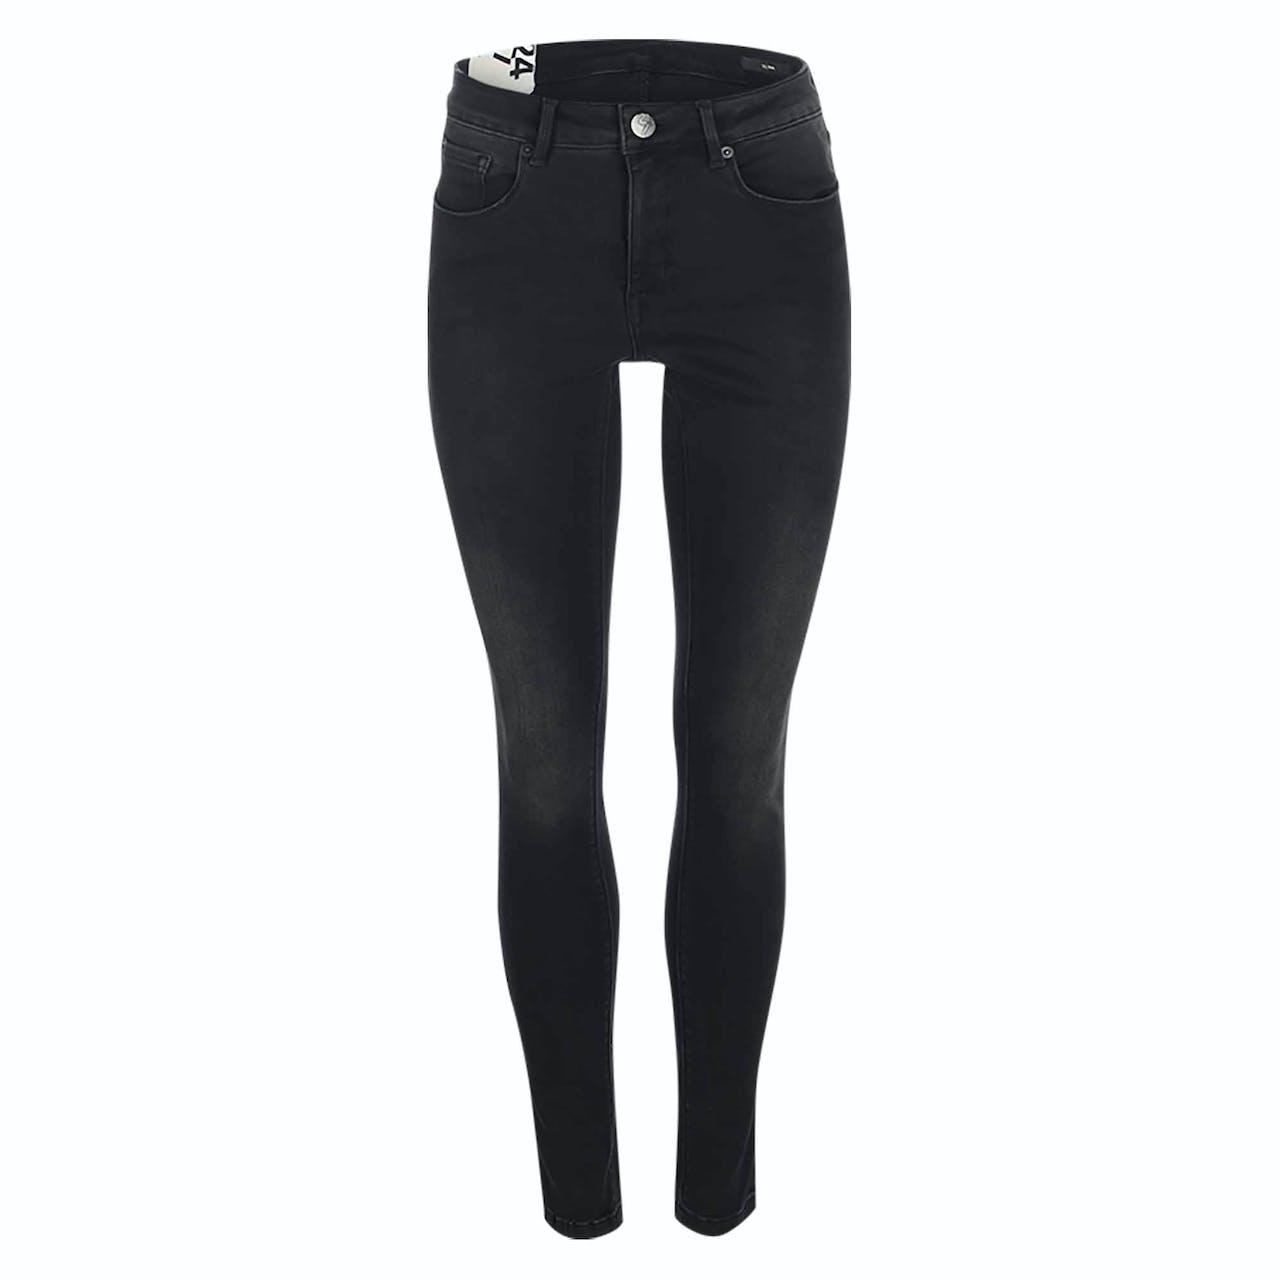 Jeans - Skinny Fit - Elma shadow